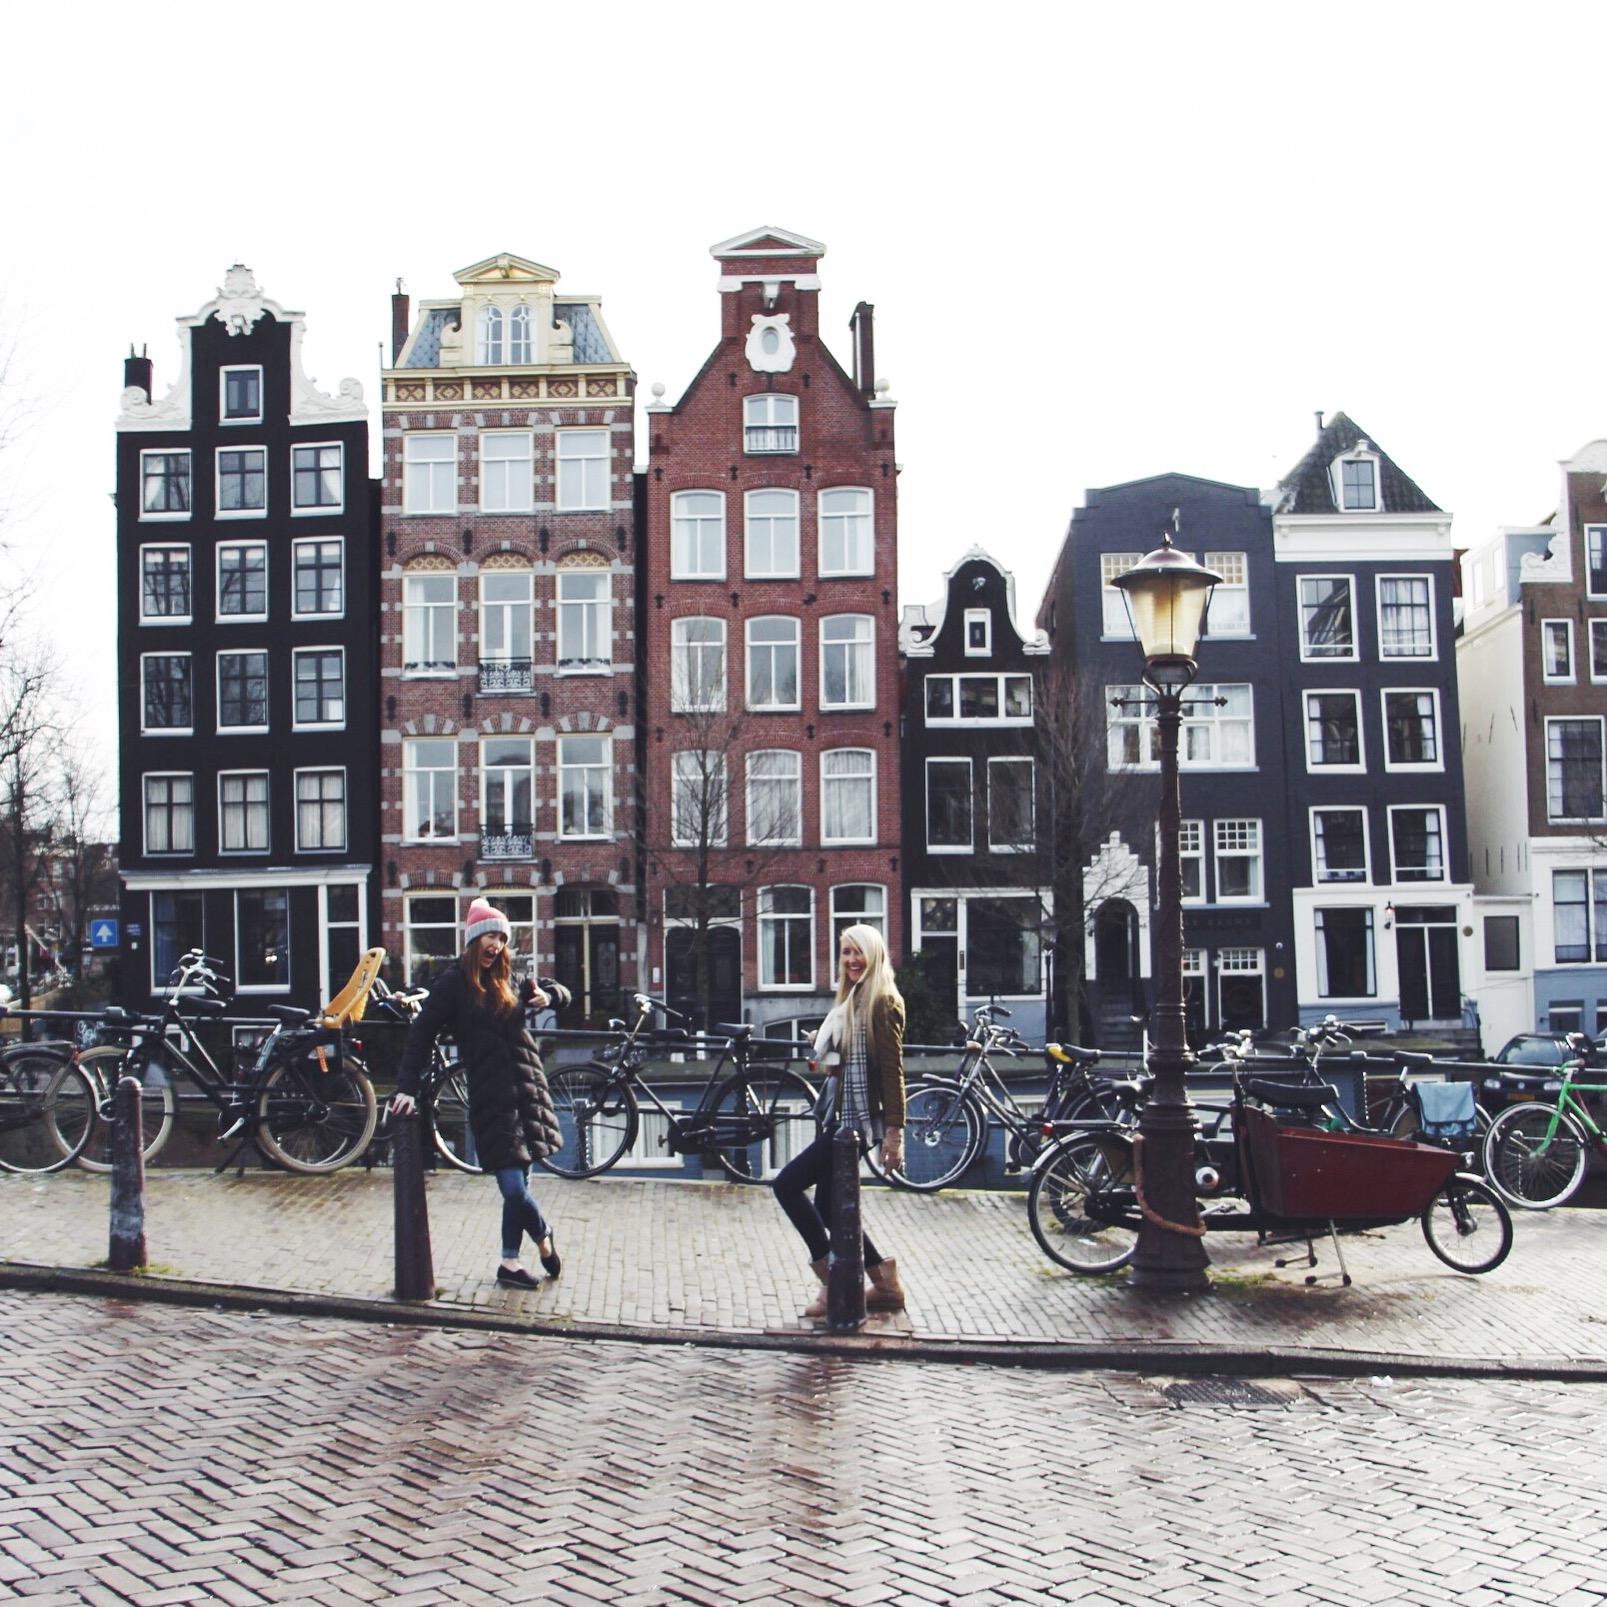 the hammels visit amsterdam!!